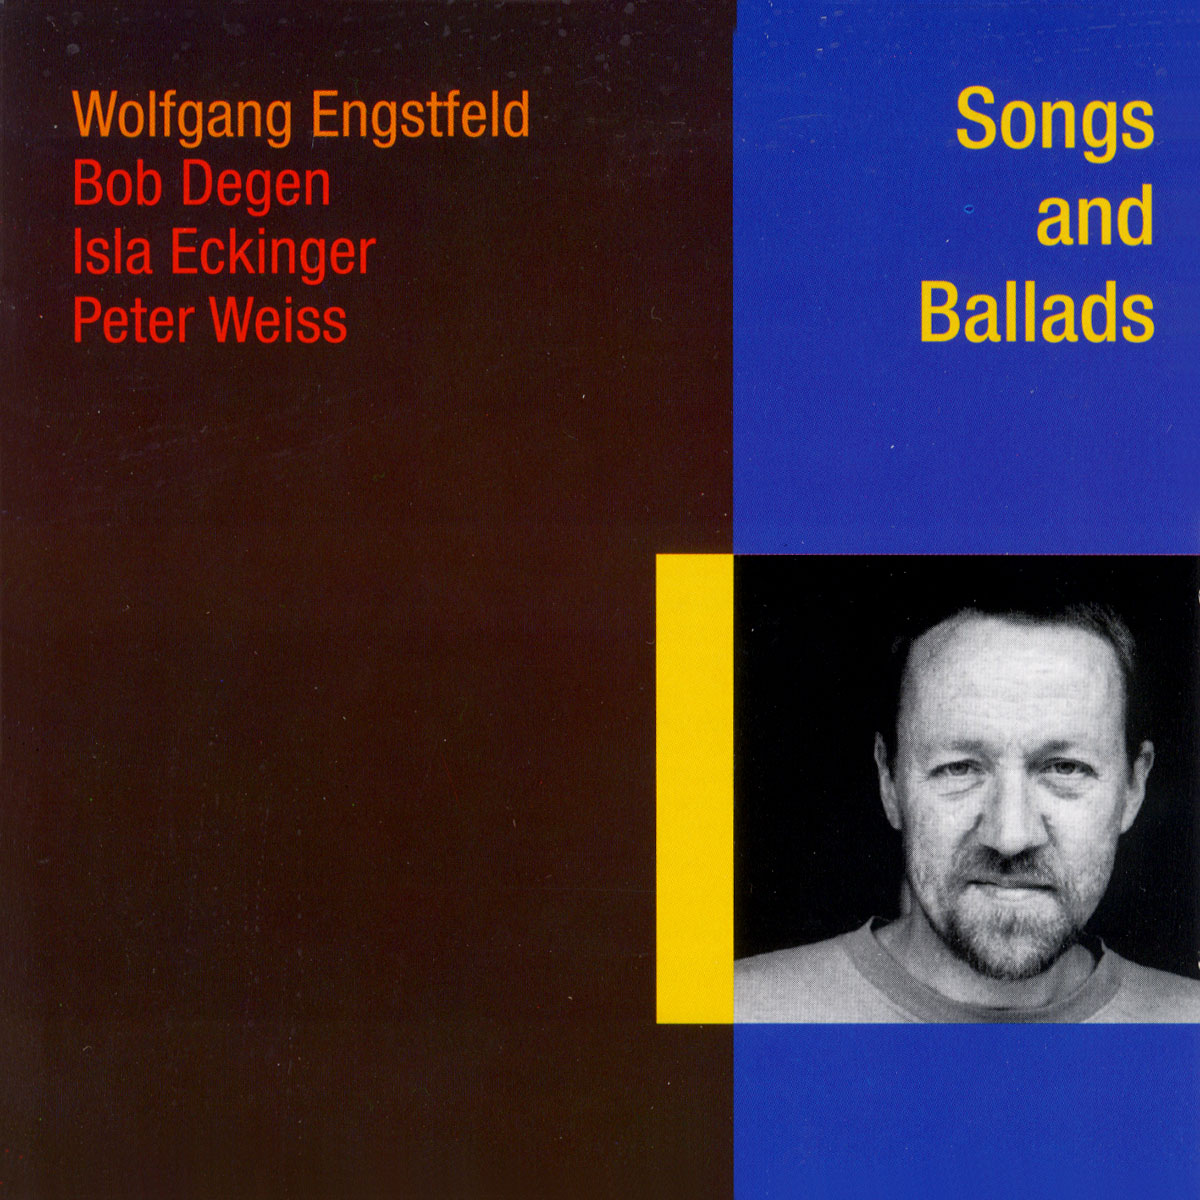 Wolfgang Engstfeld